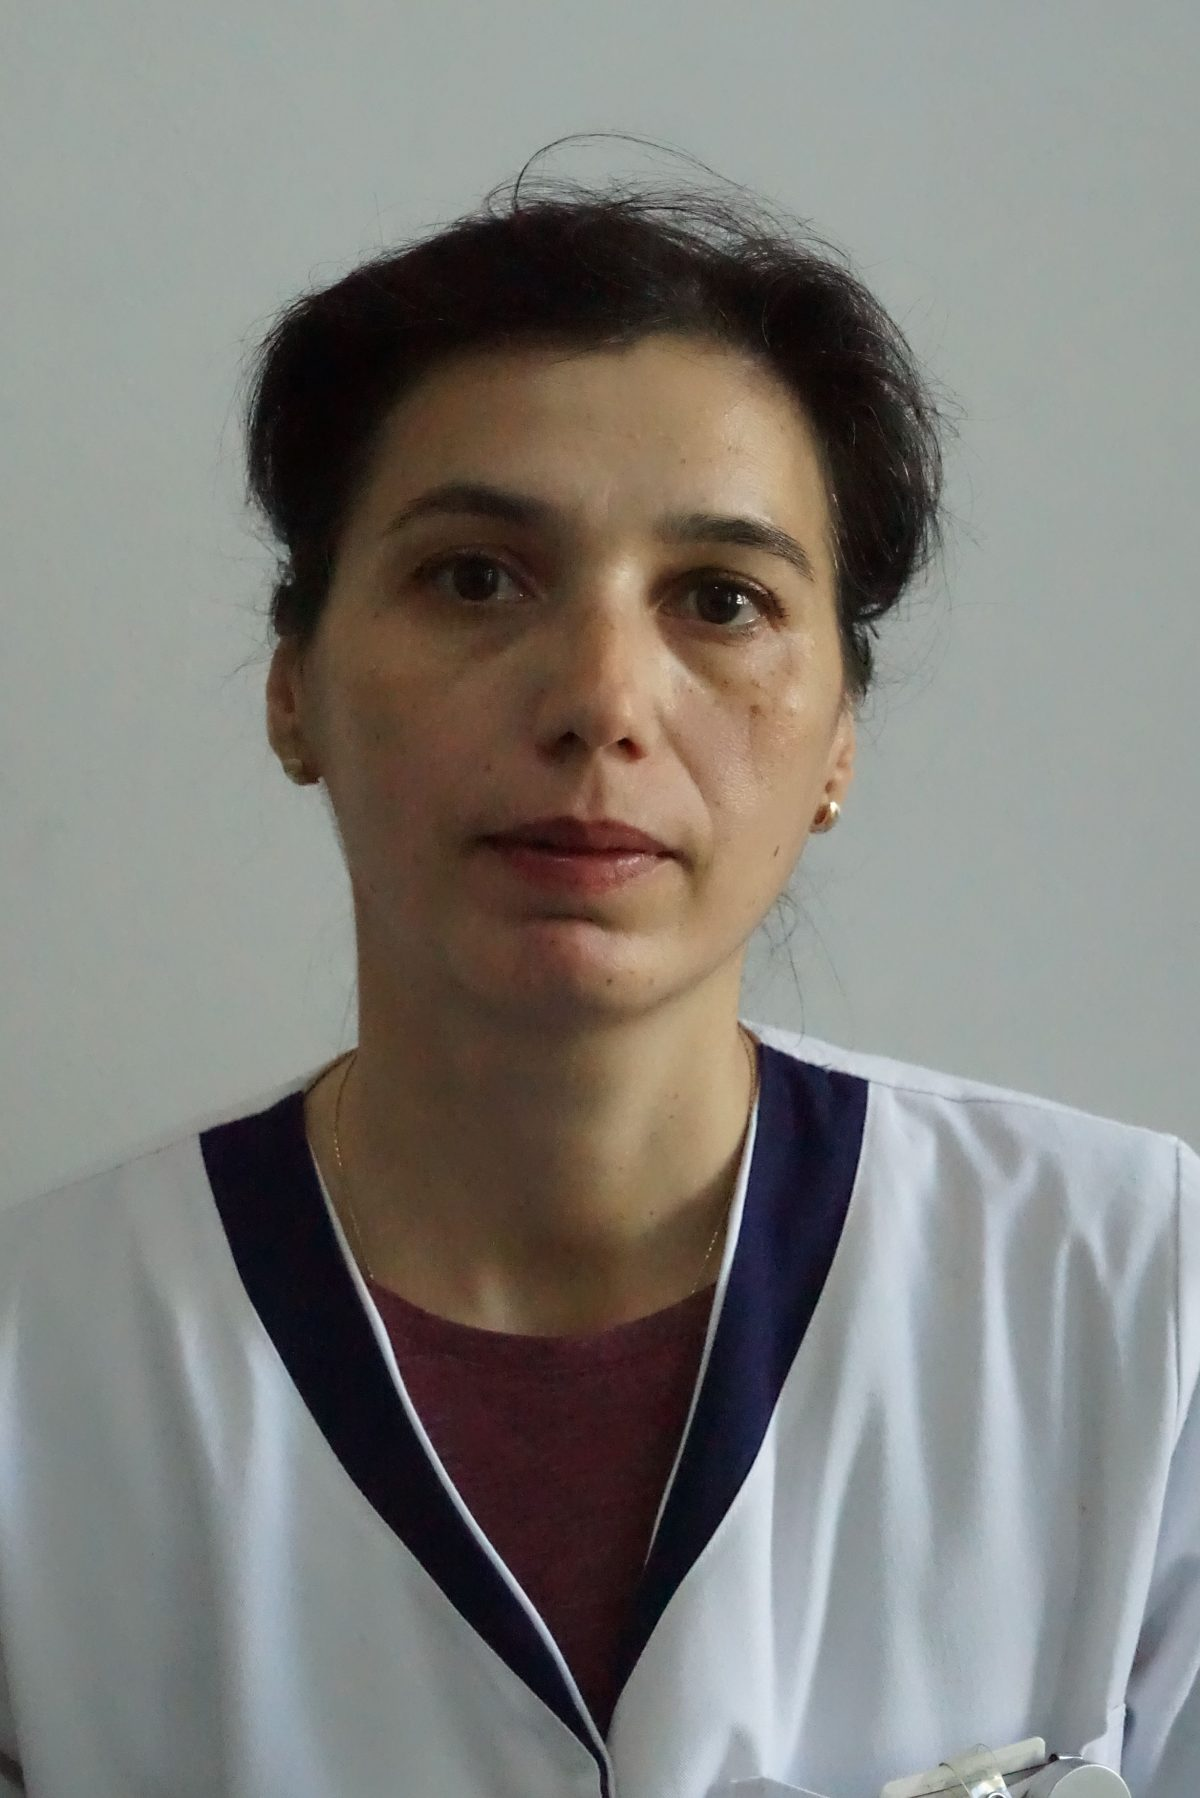 DanielaIova00137-copy-1200x1798.jpg